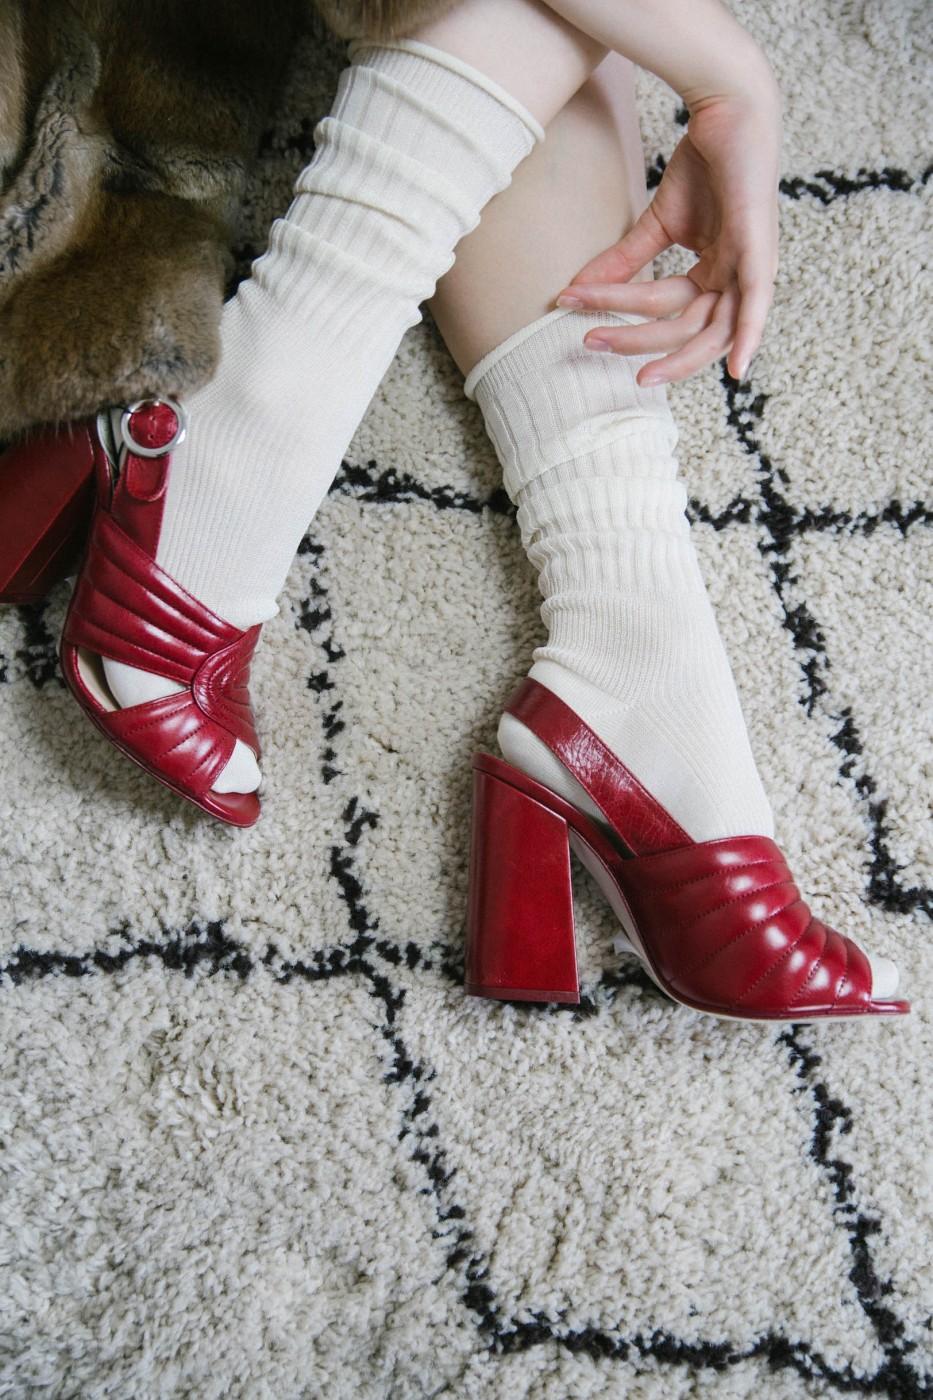 chaussettes-pas-chasse-2